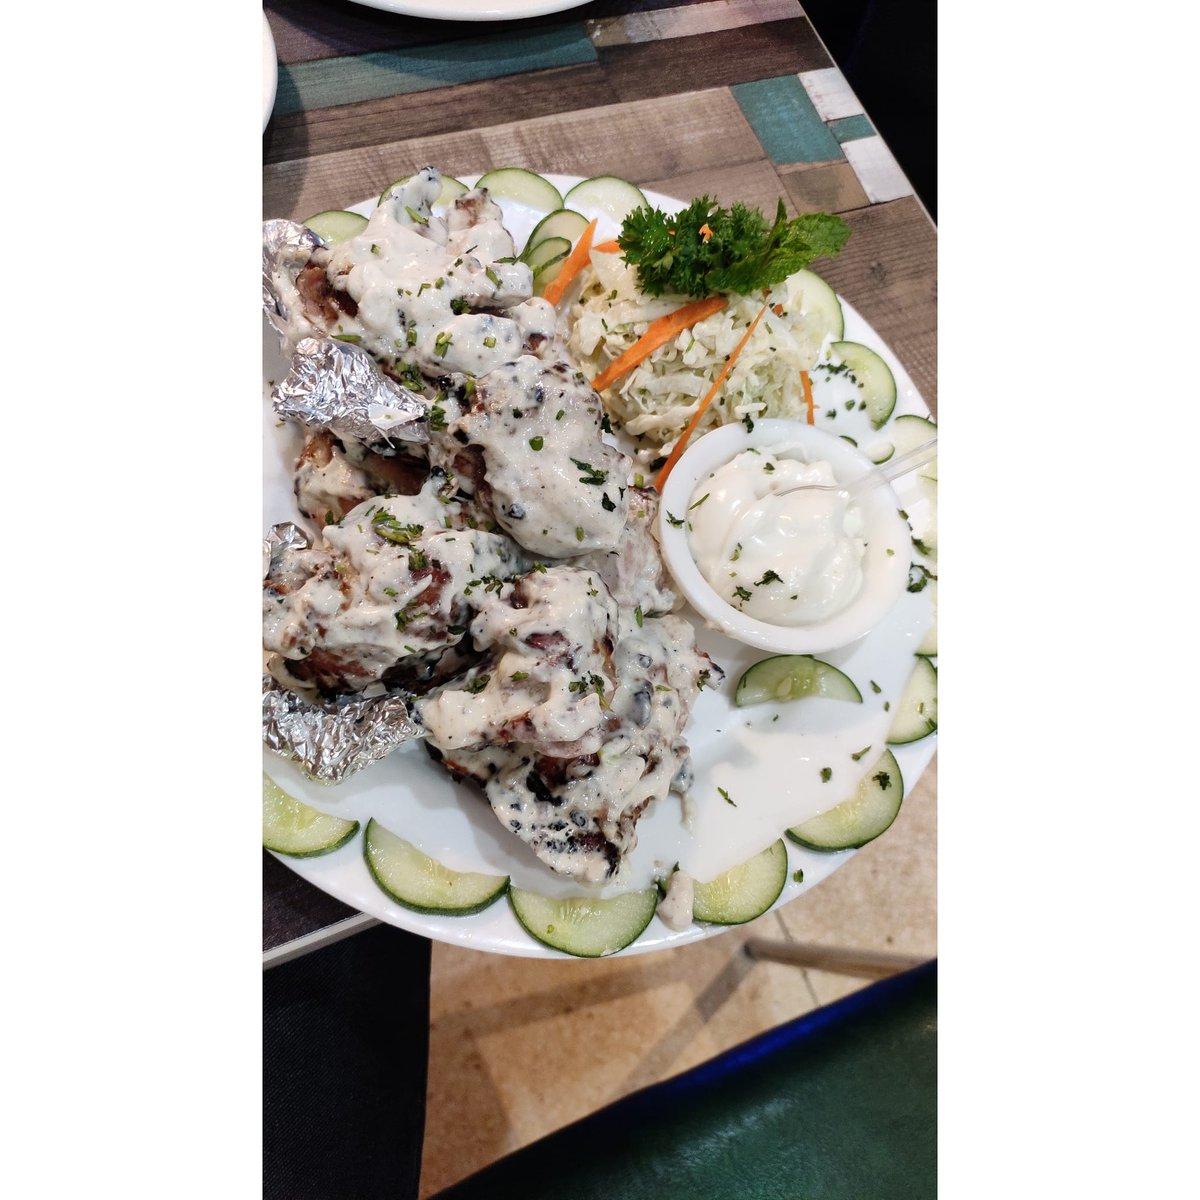 #afghanichicken #chicken #goodfood #goodmoments#foodie #foodies #foodislifepic.twitter.com/45i47QFMjx – at Srinagar